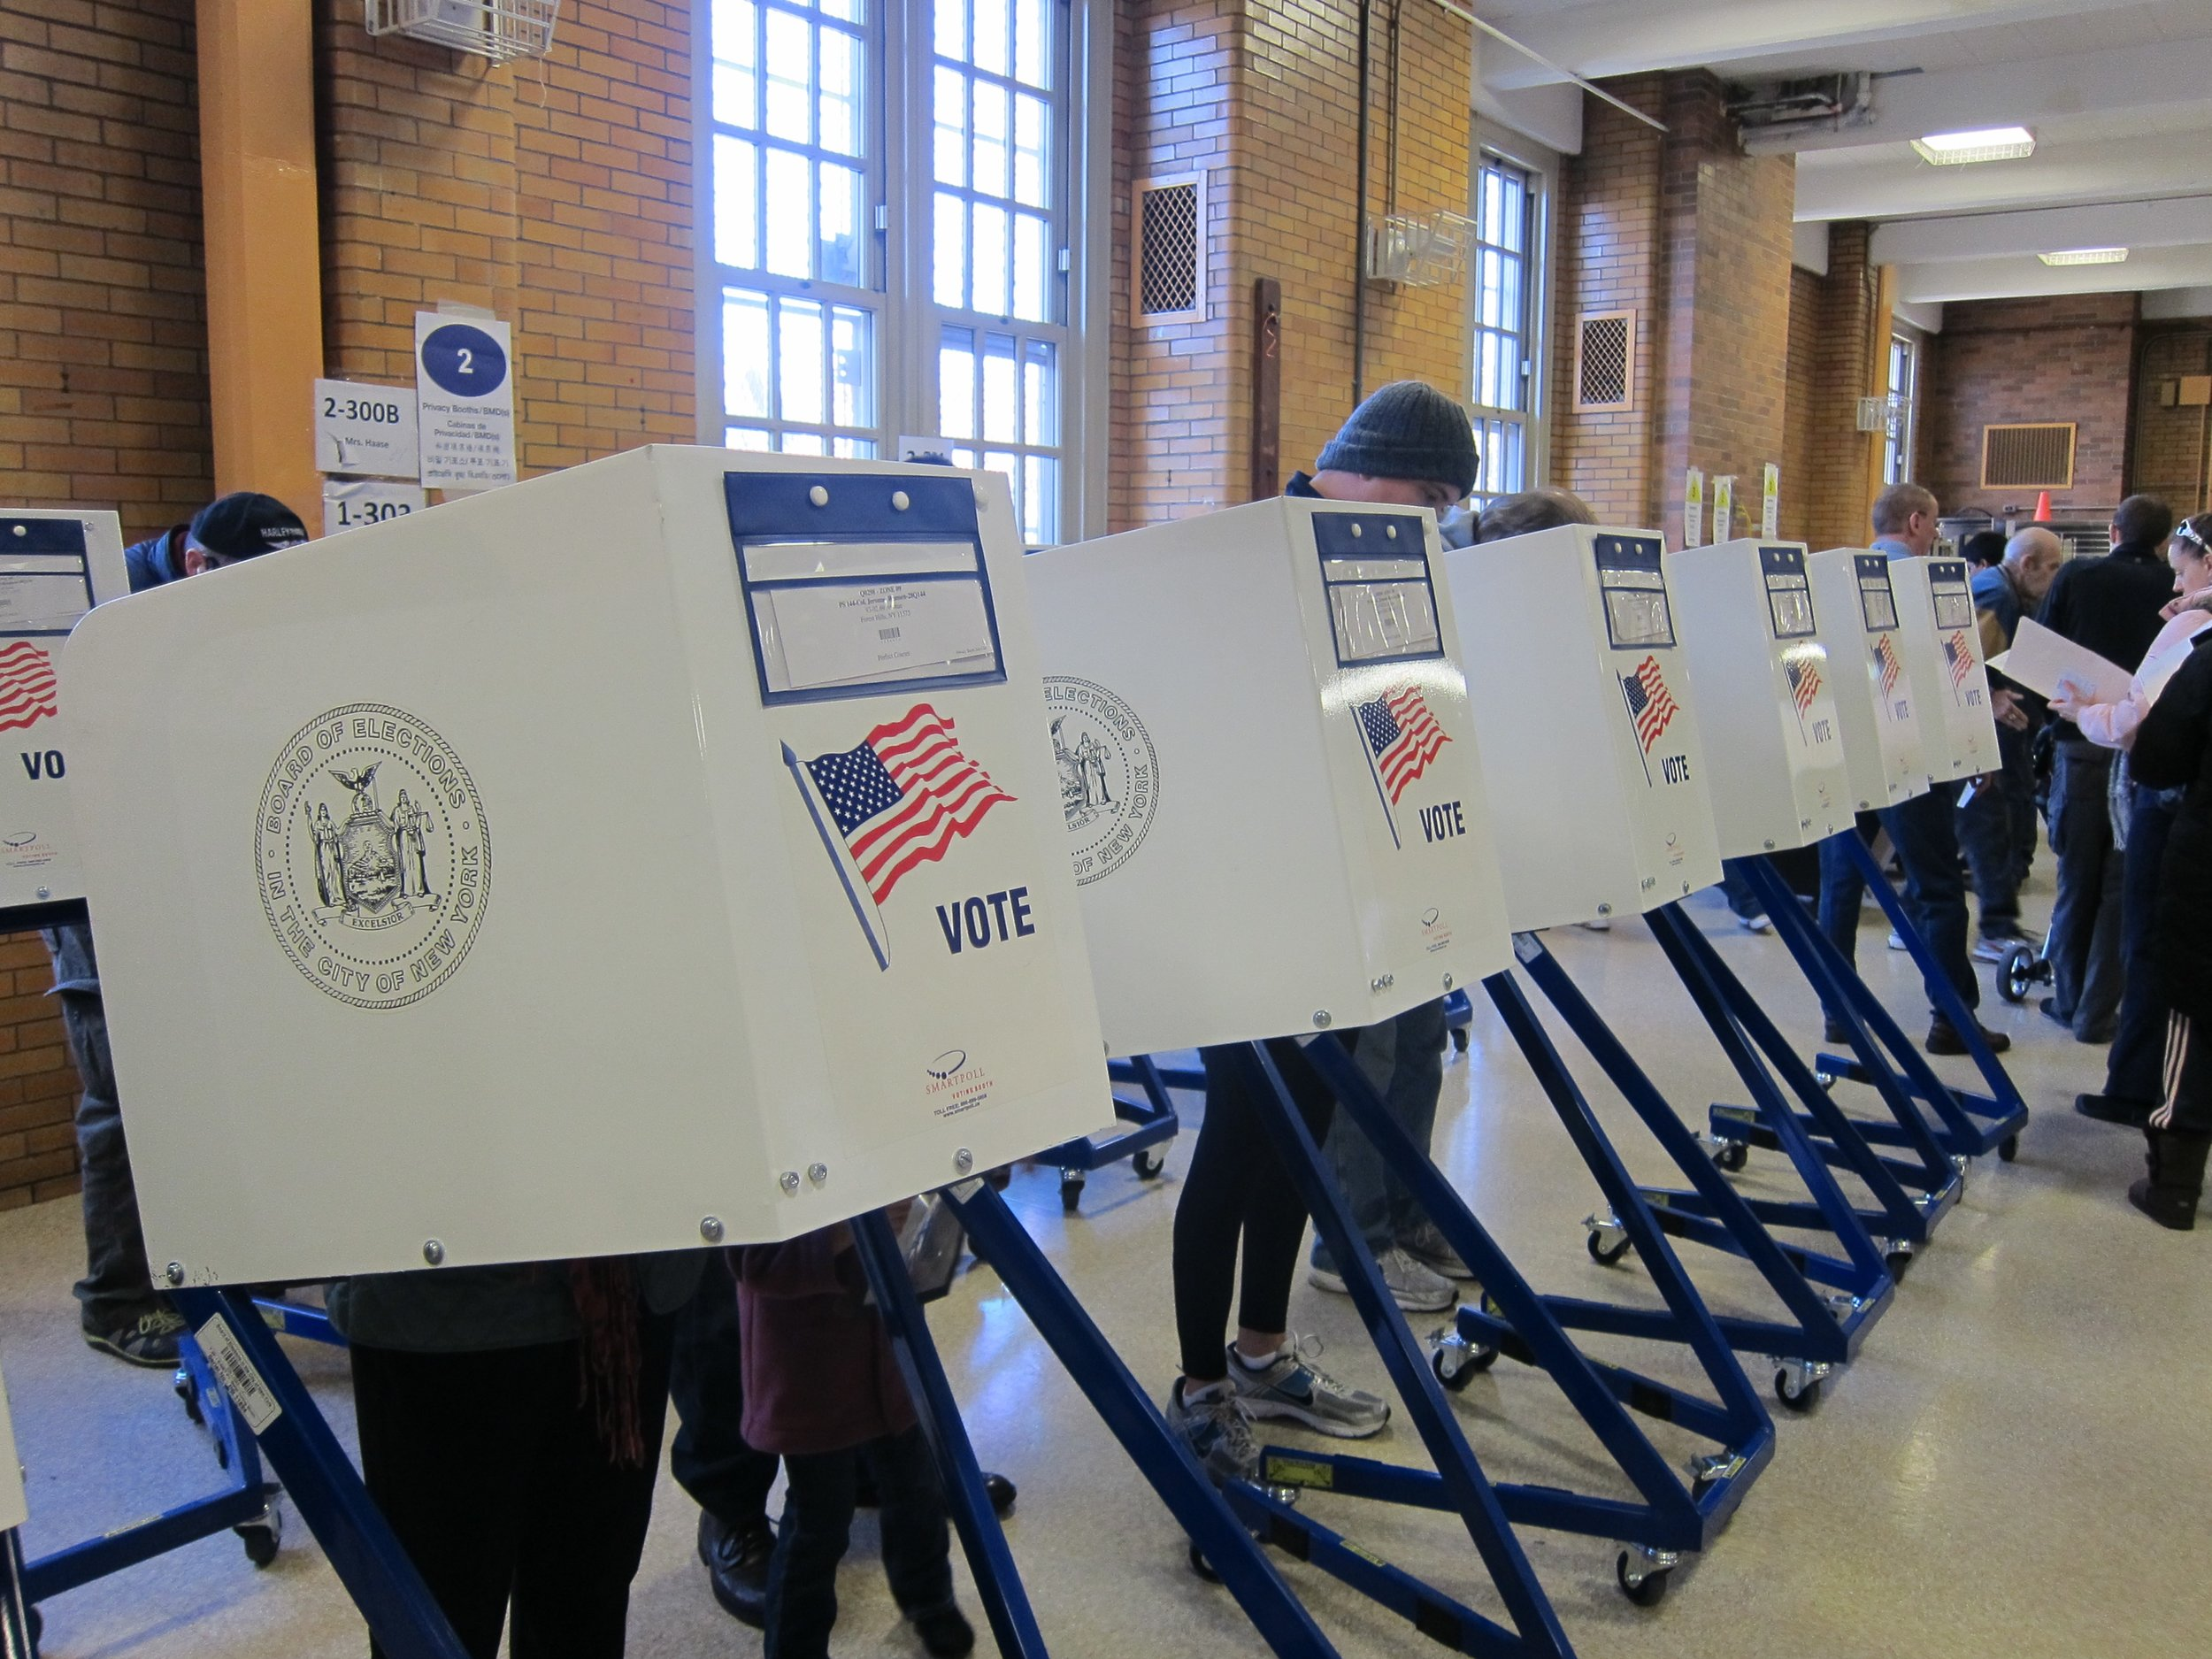 Have you voted yet? (Joe Shlabotnik, Flickr, Creative Commons )